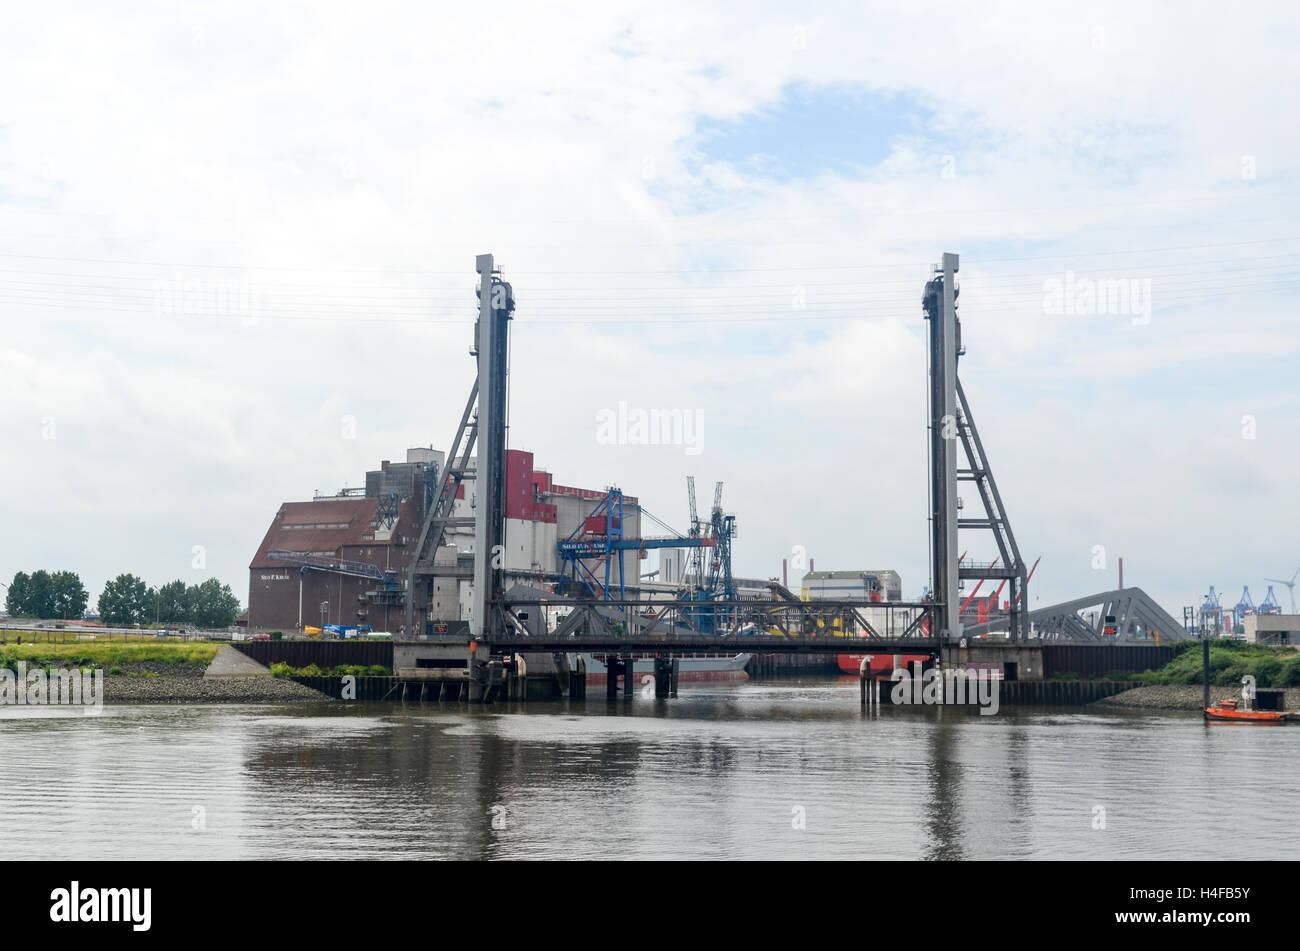 Vertical-lift bridge in Hamburg industrial area, Germany - Stock Image